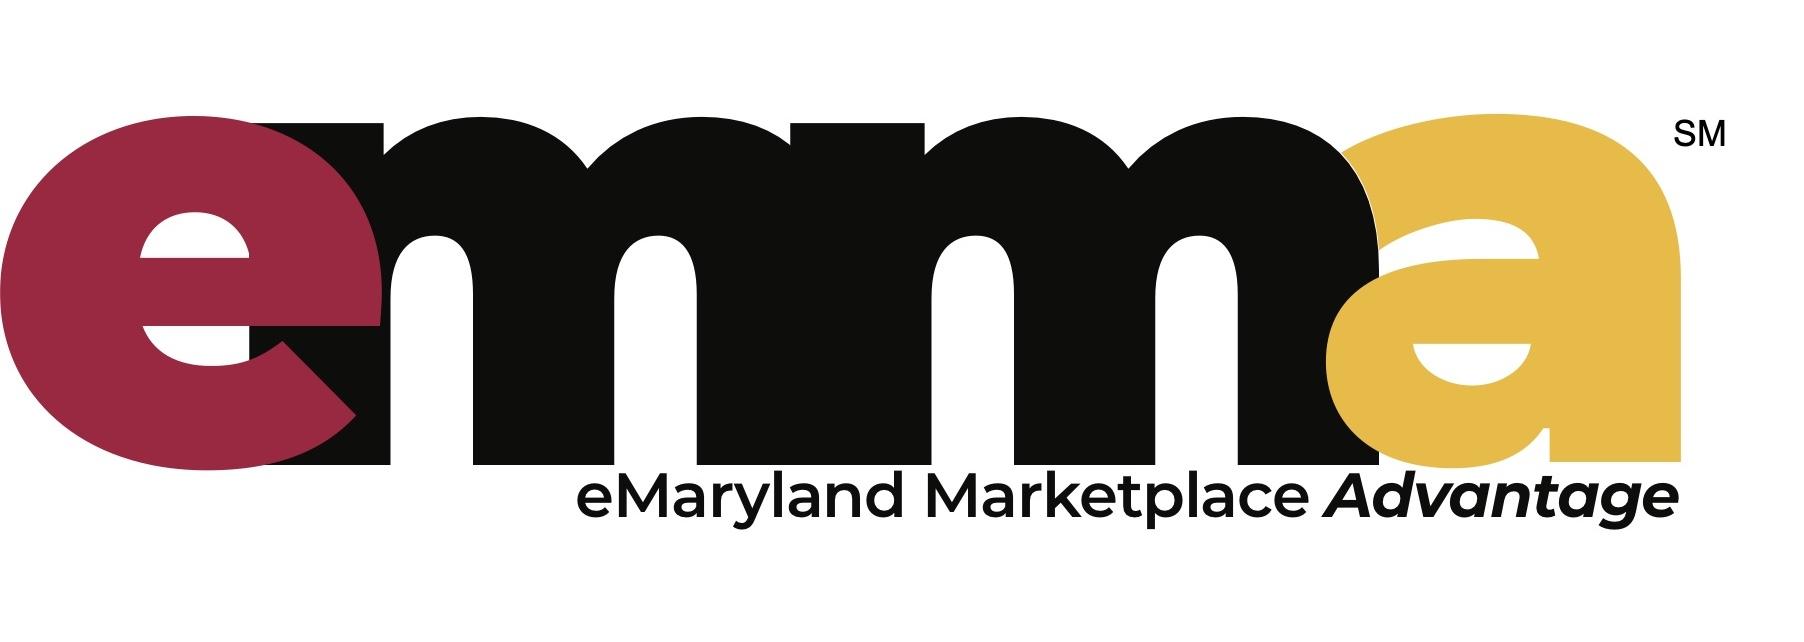 Welcome to eMaryland Marketplace Advantage (eMMA)